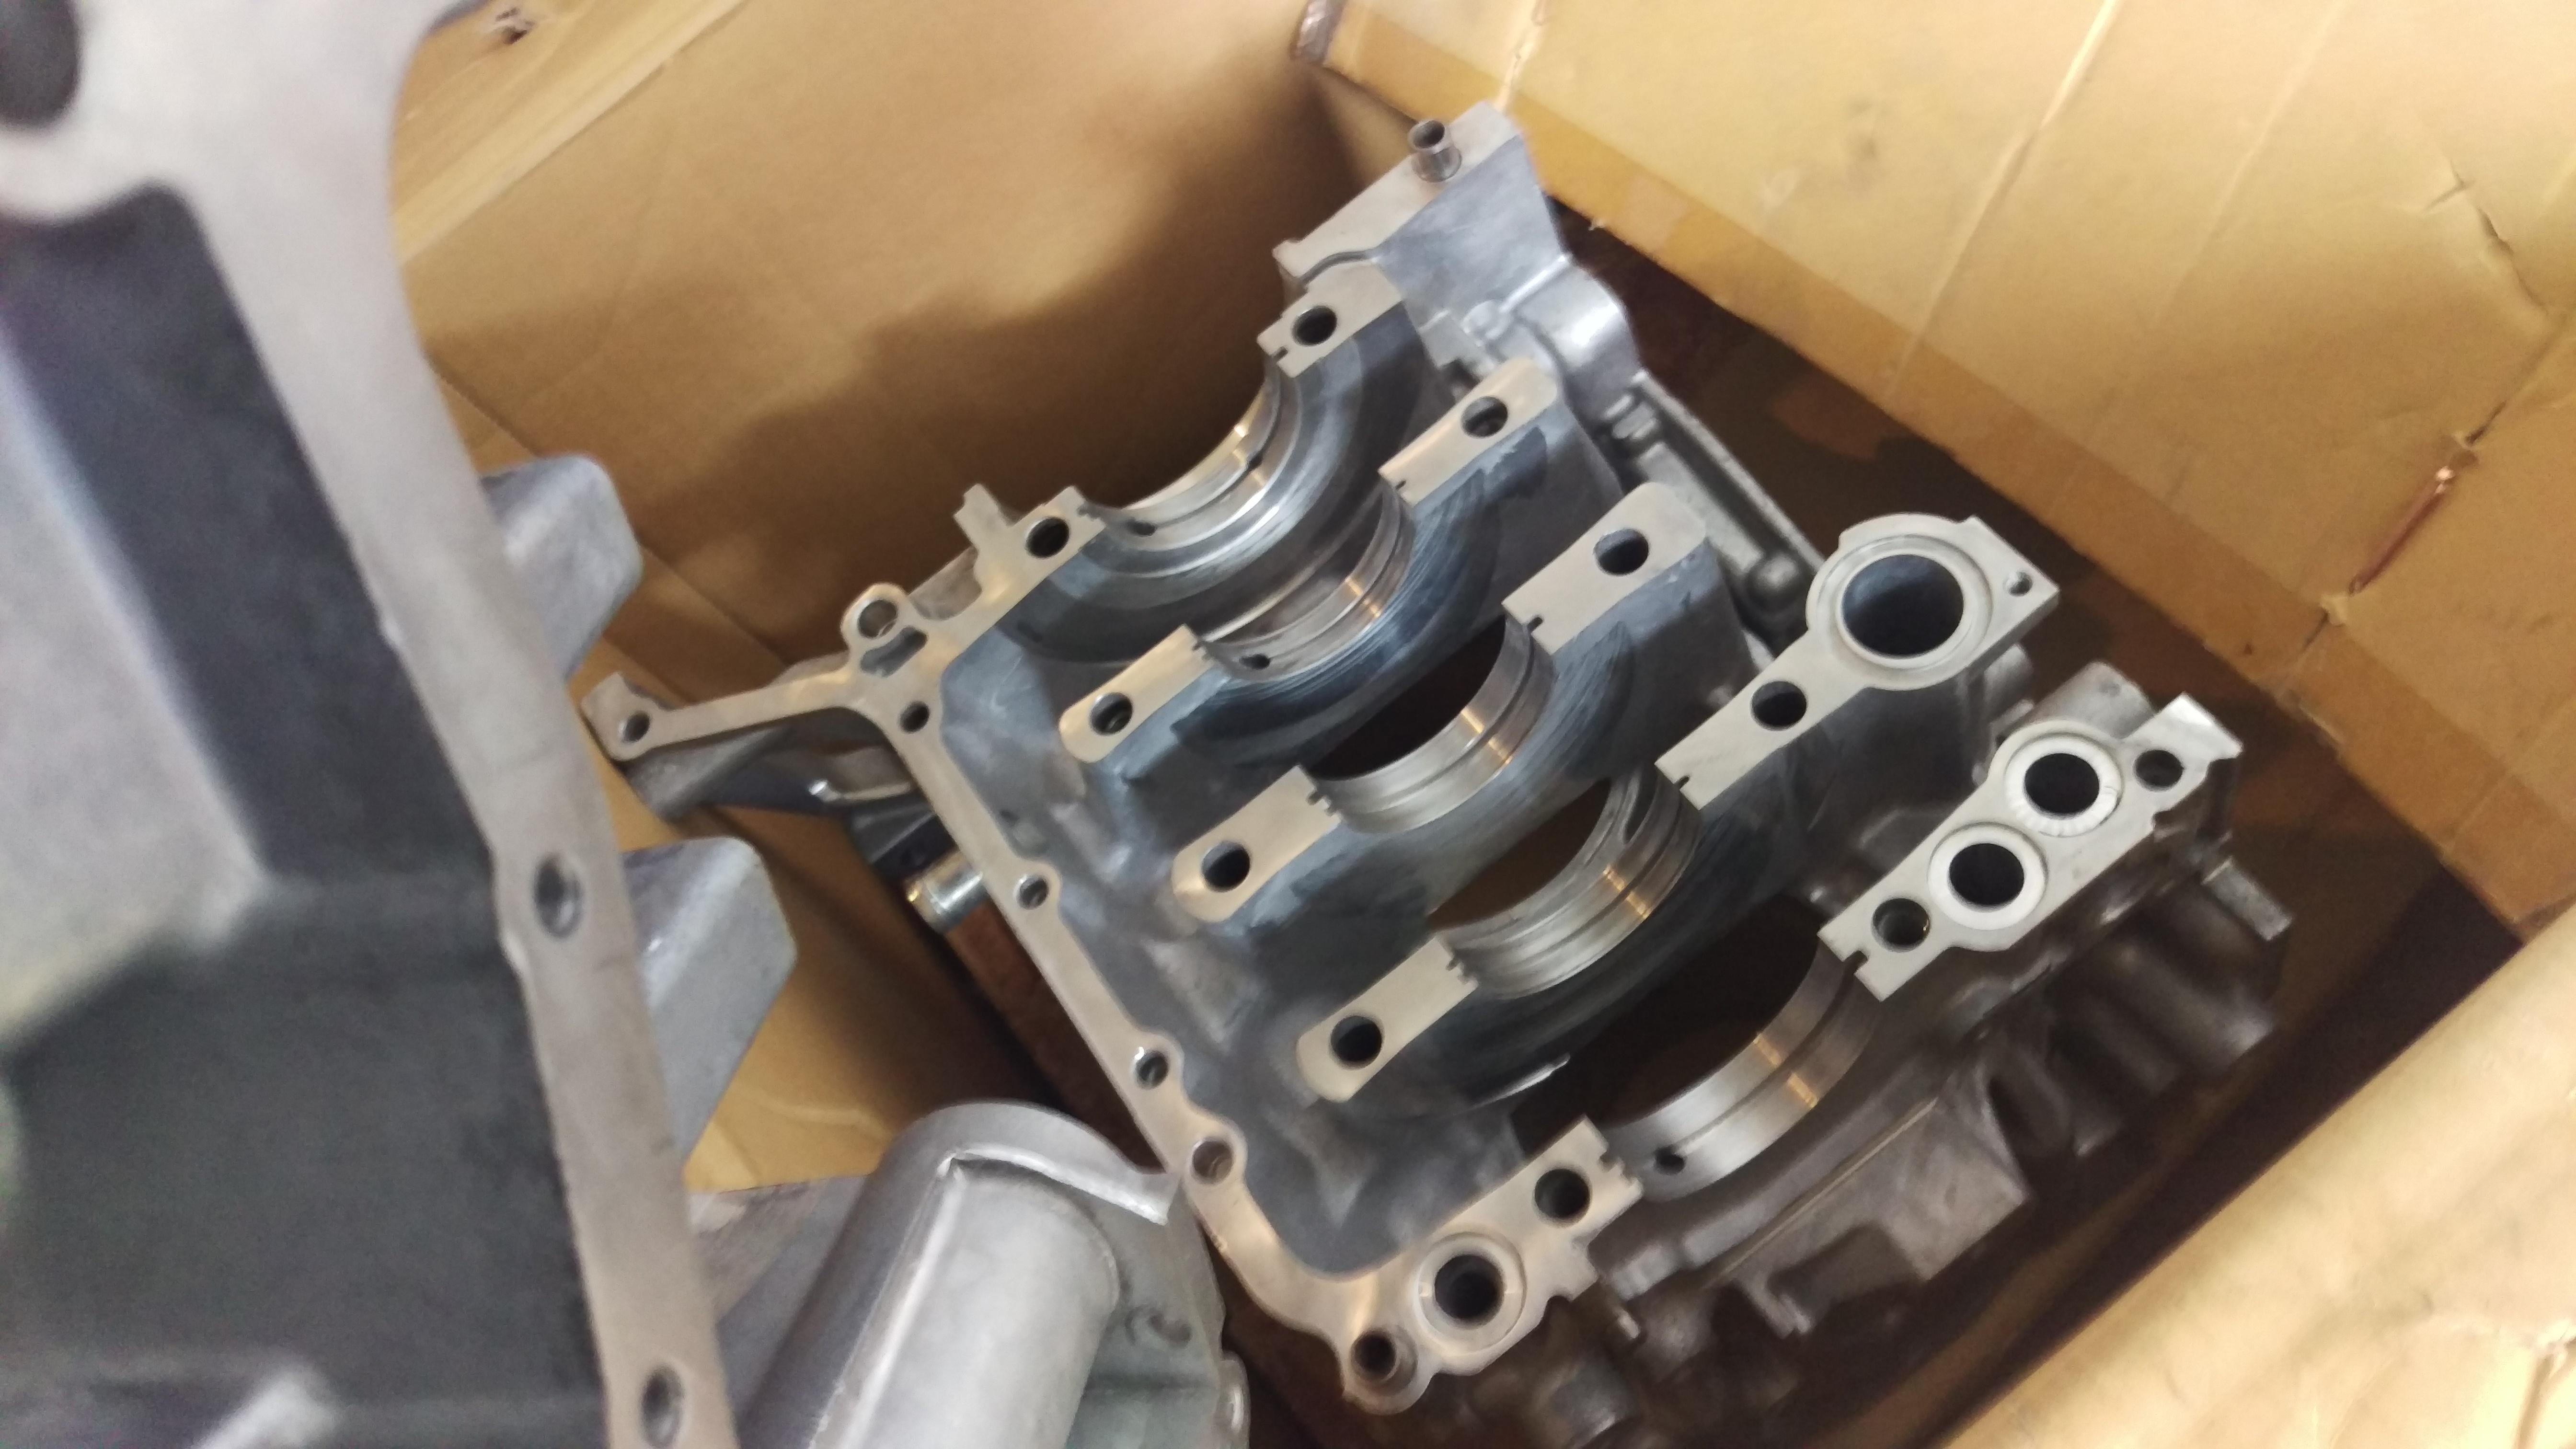 Engine build w/ ej257 short block - Page 2 - Subaru Legacy